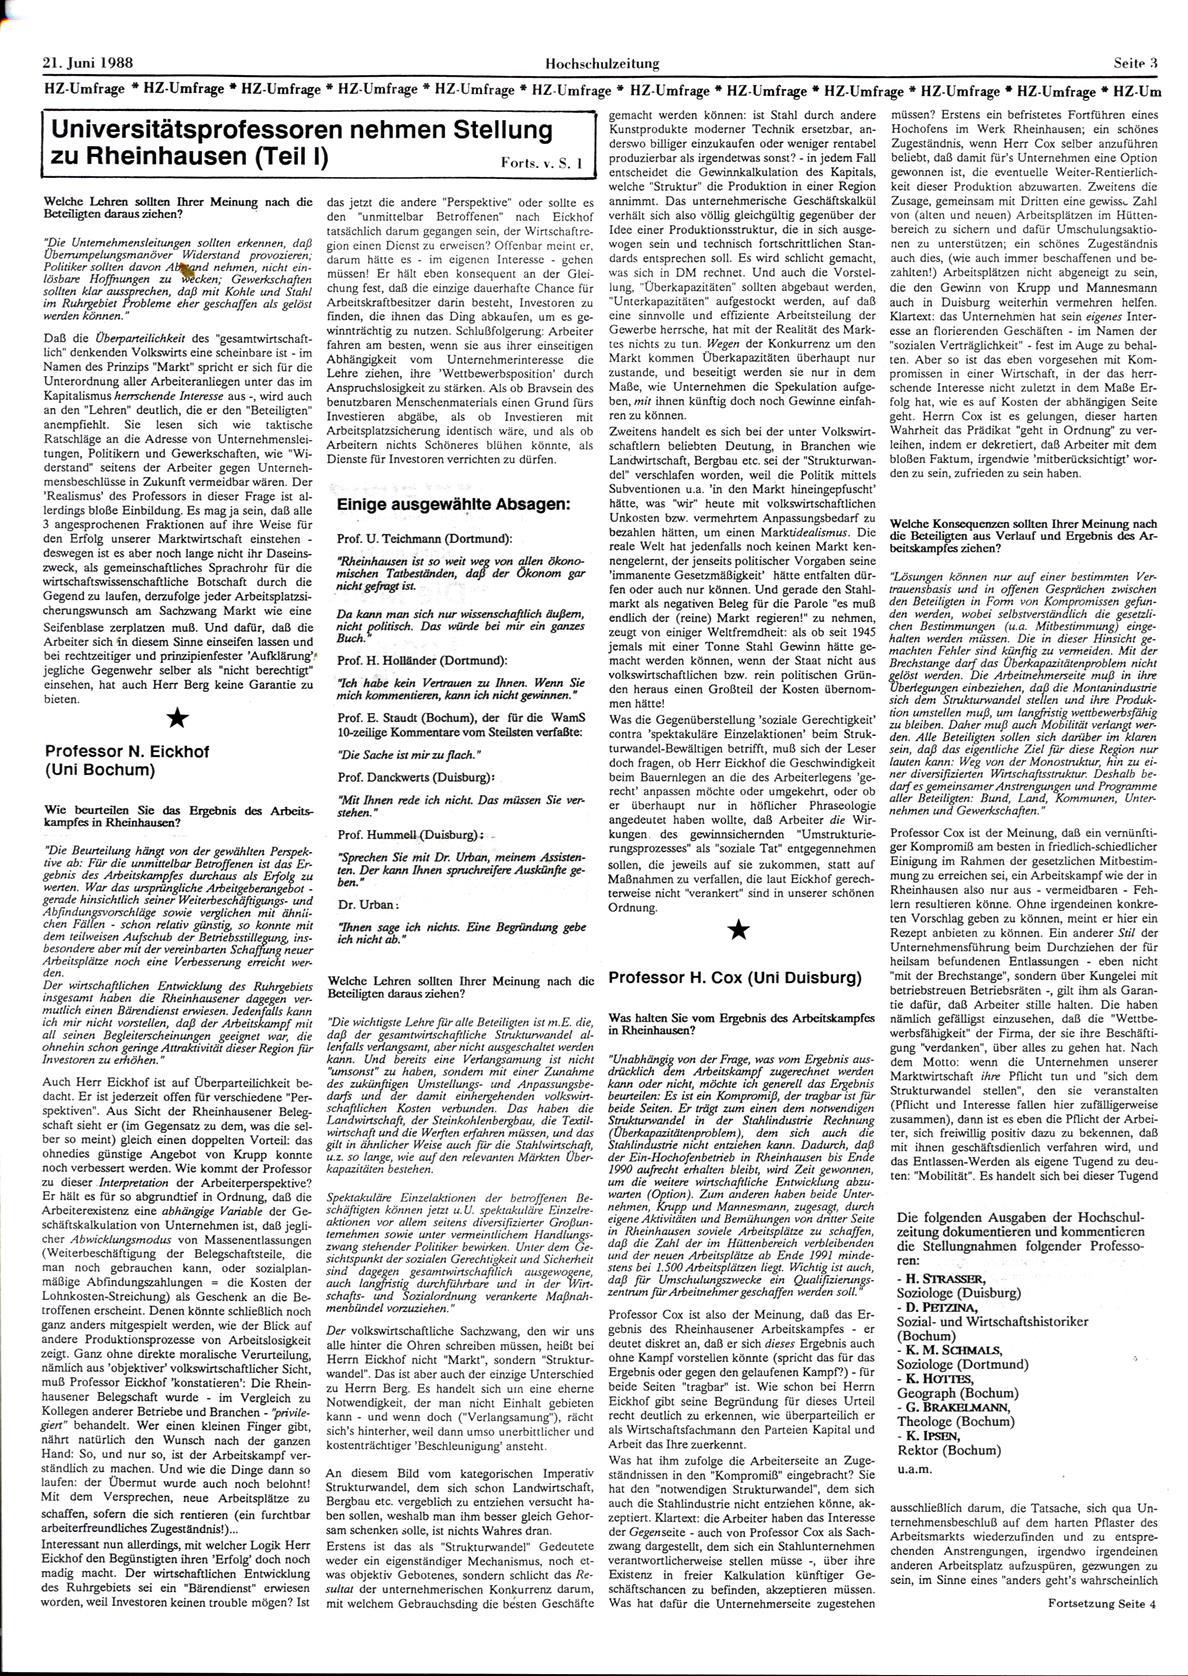 Bochum_BHZ_19880621_173_003